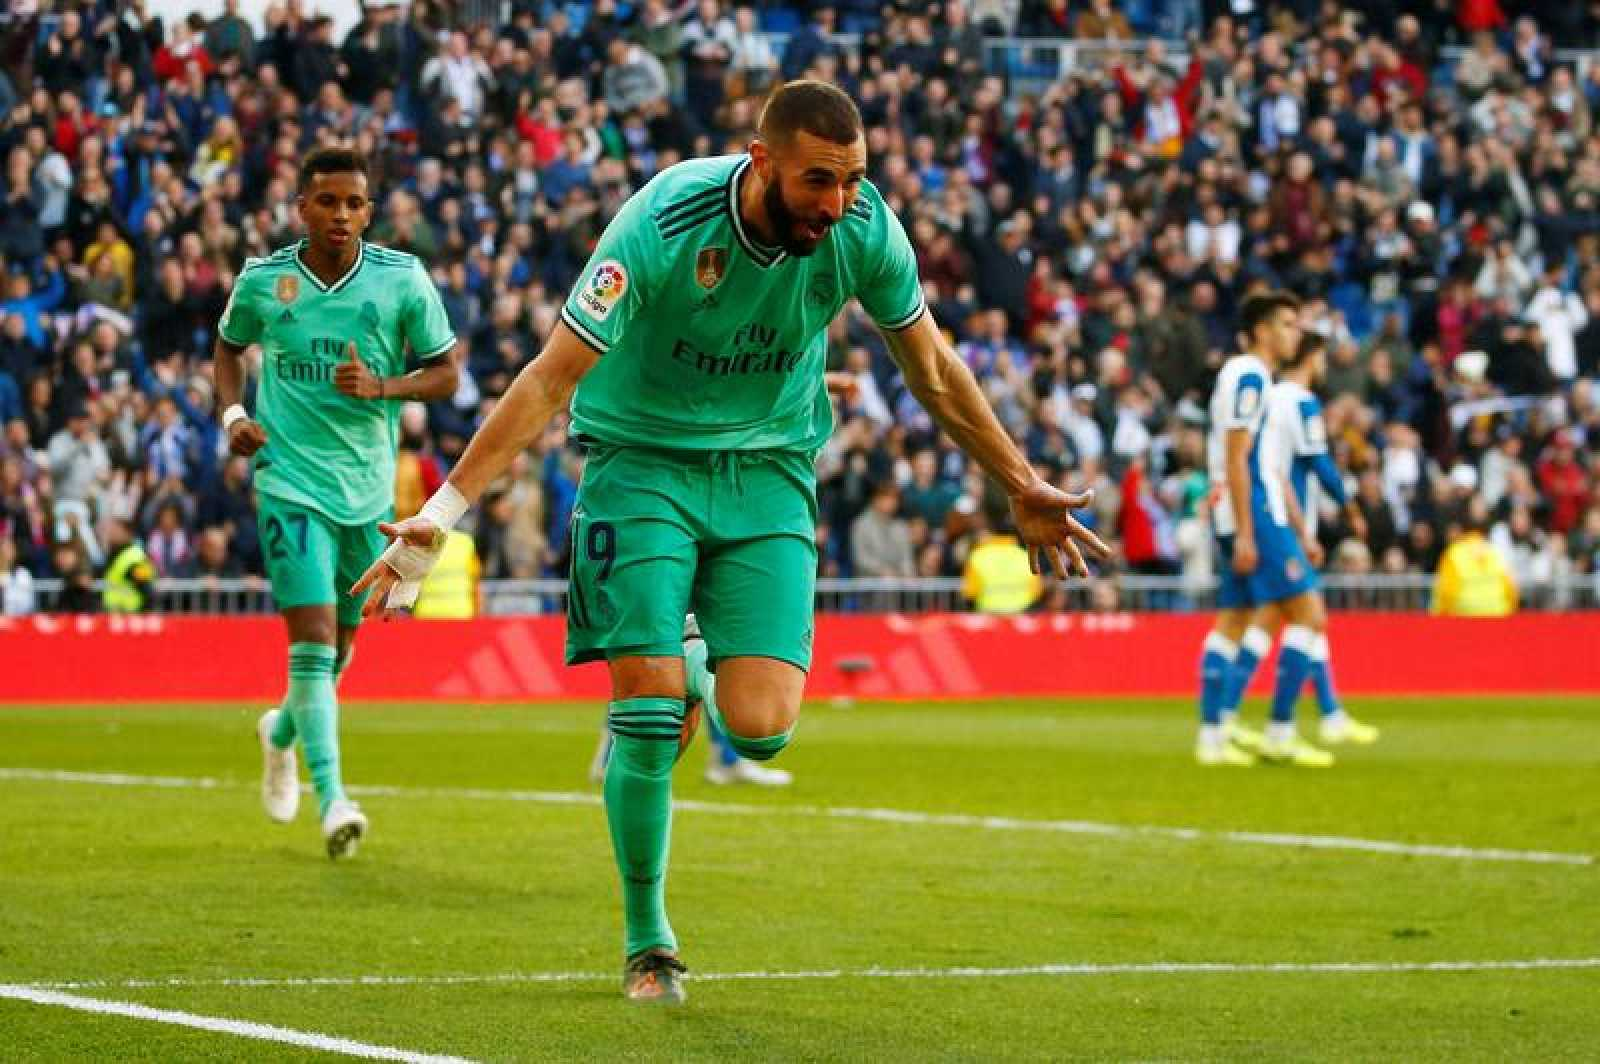 Benzema celebra su gol ante el Espanyol